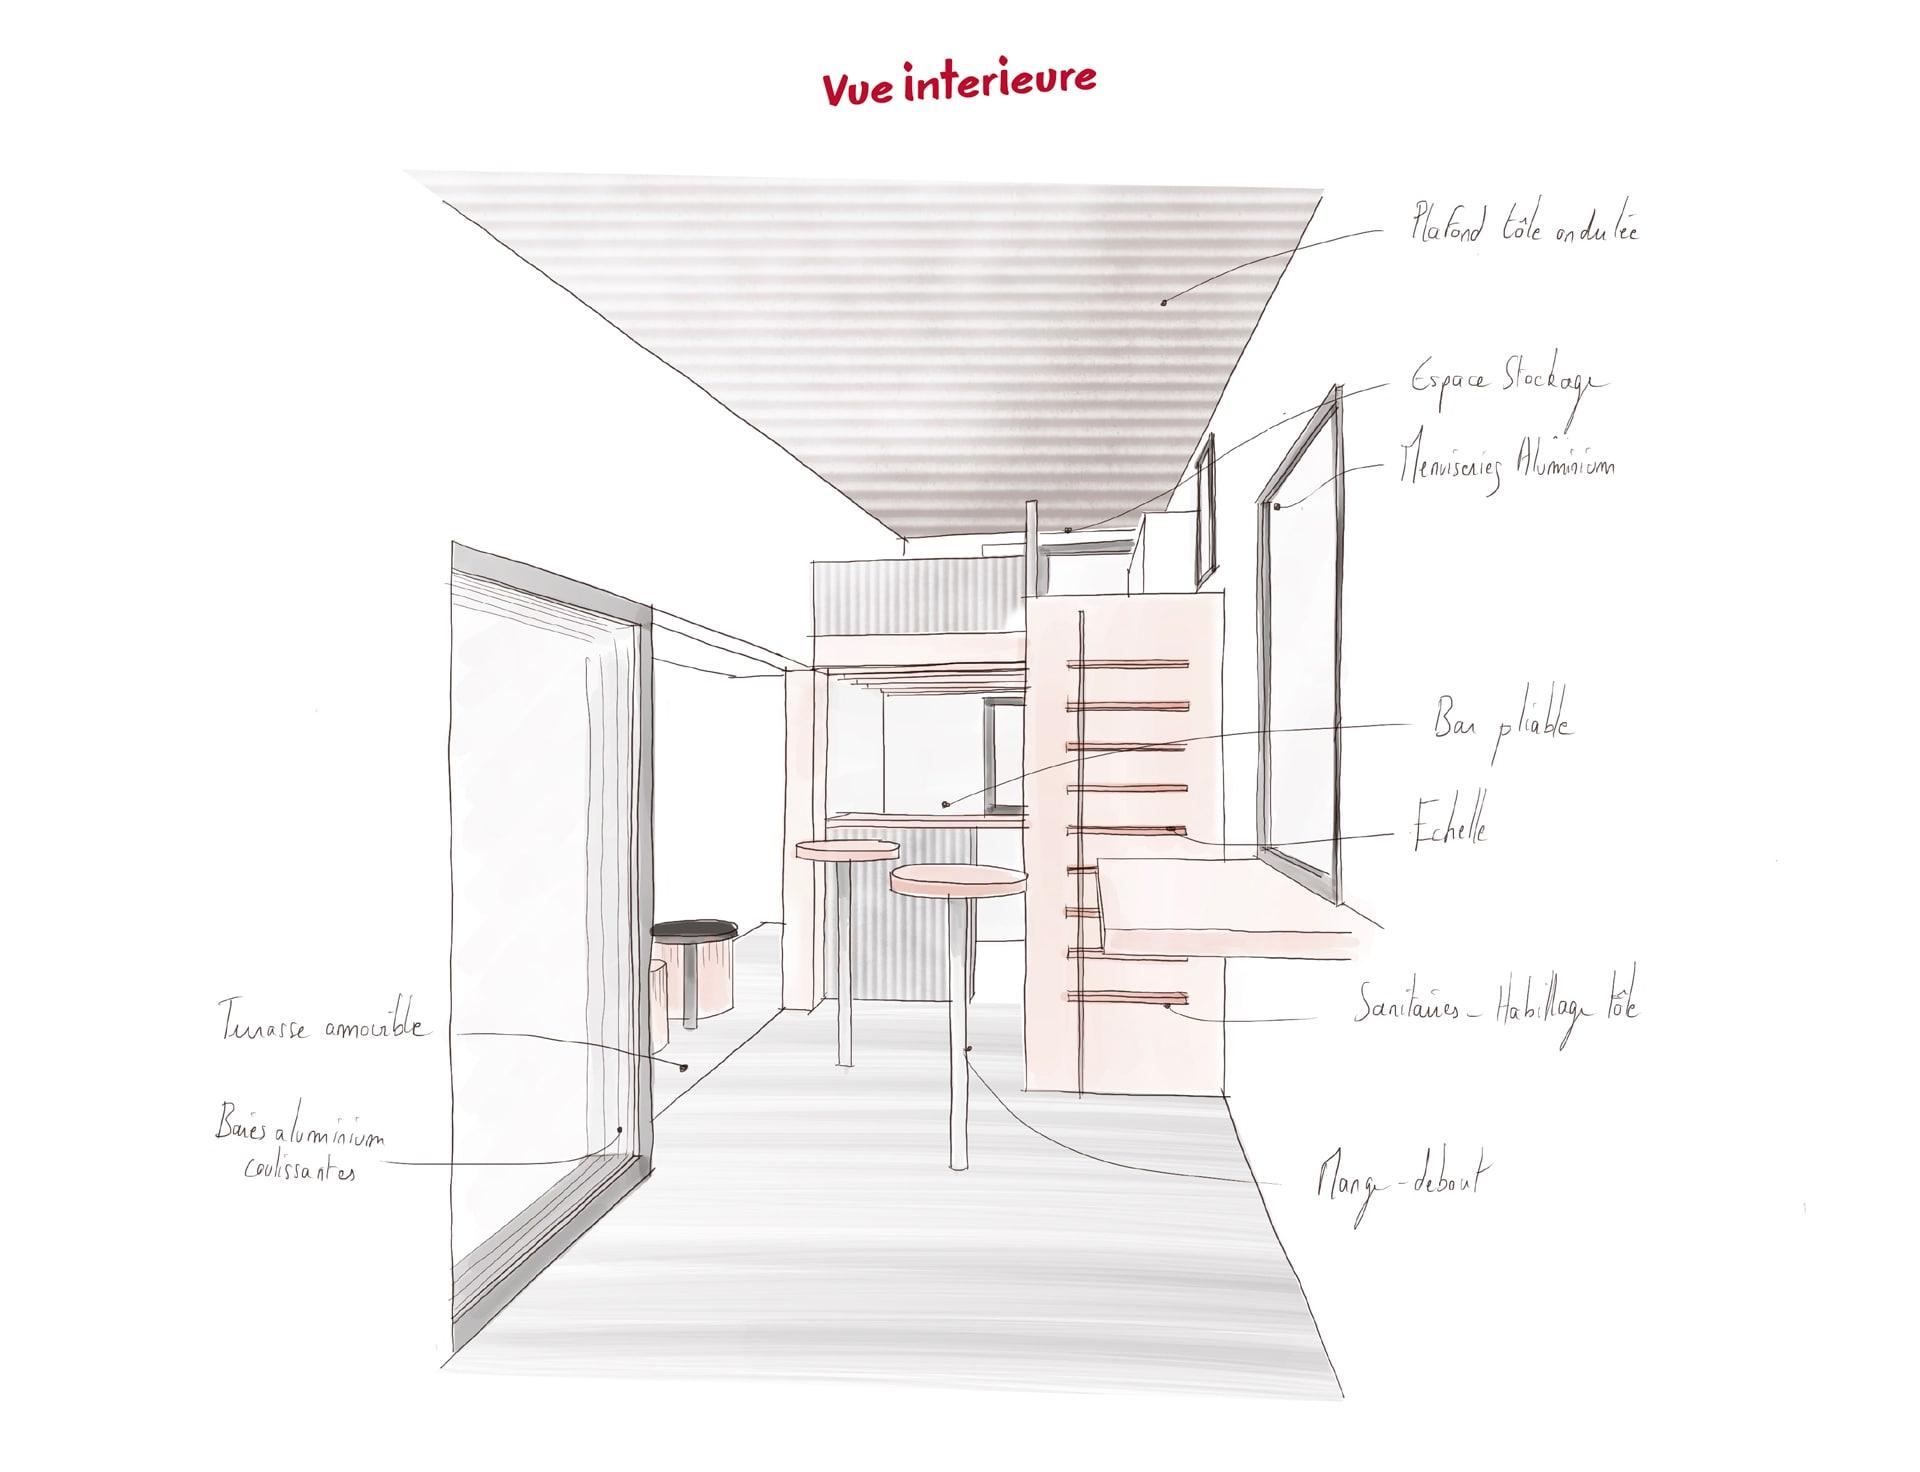 tiny-house-professionnel-bar-vue-interieure